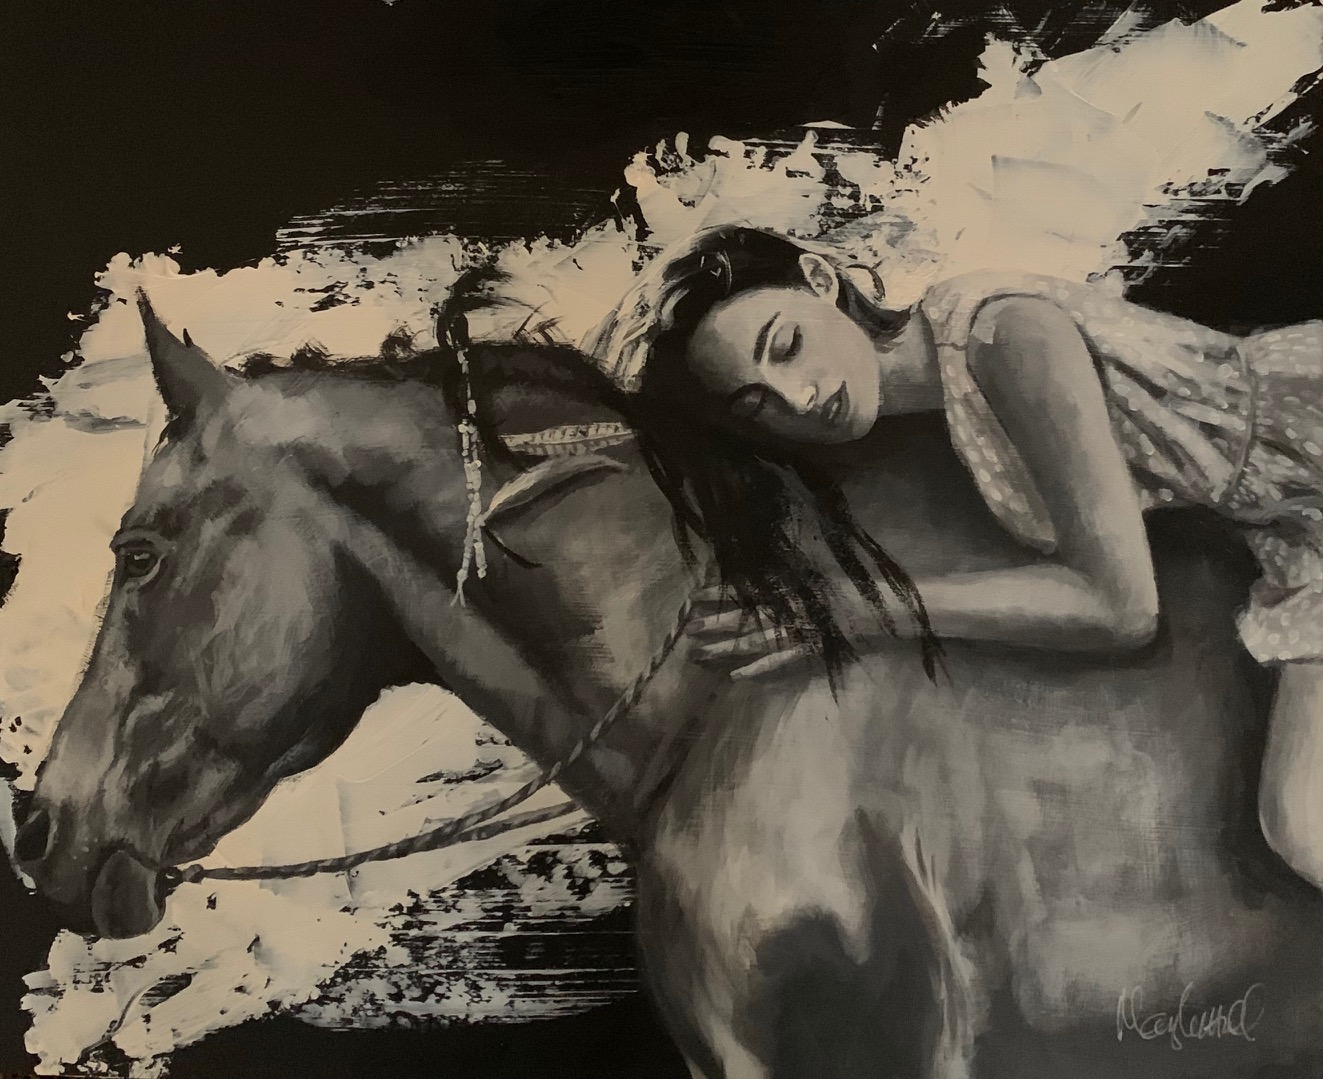 Mary Luttrell: Breathe